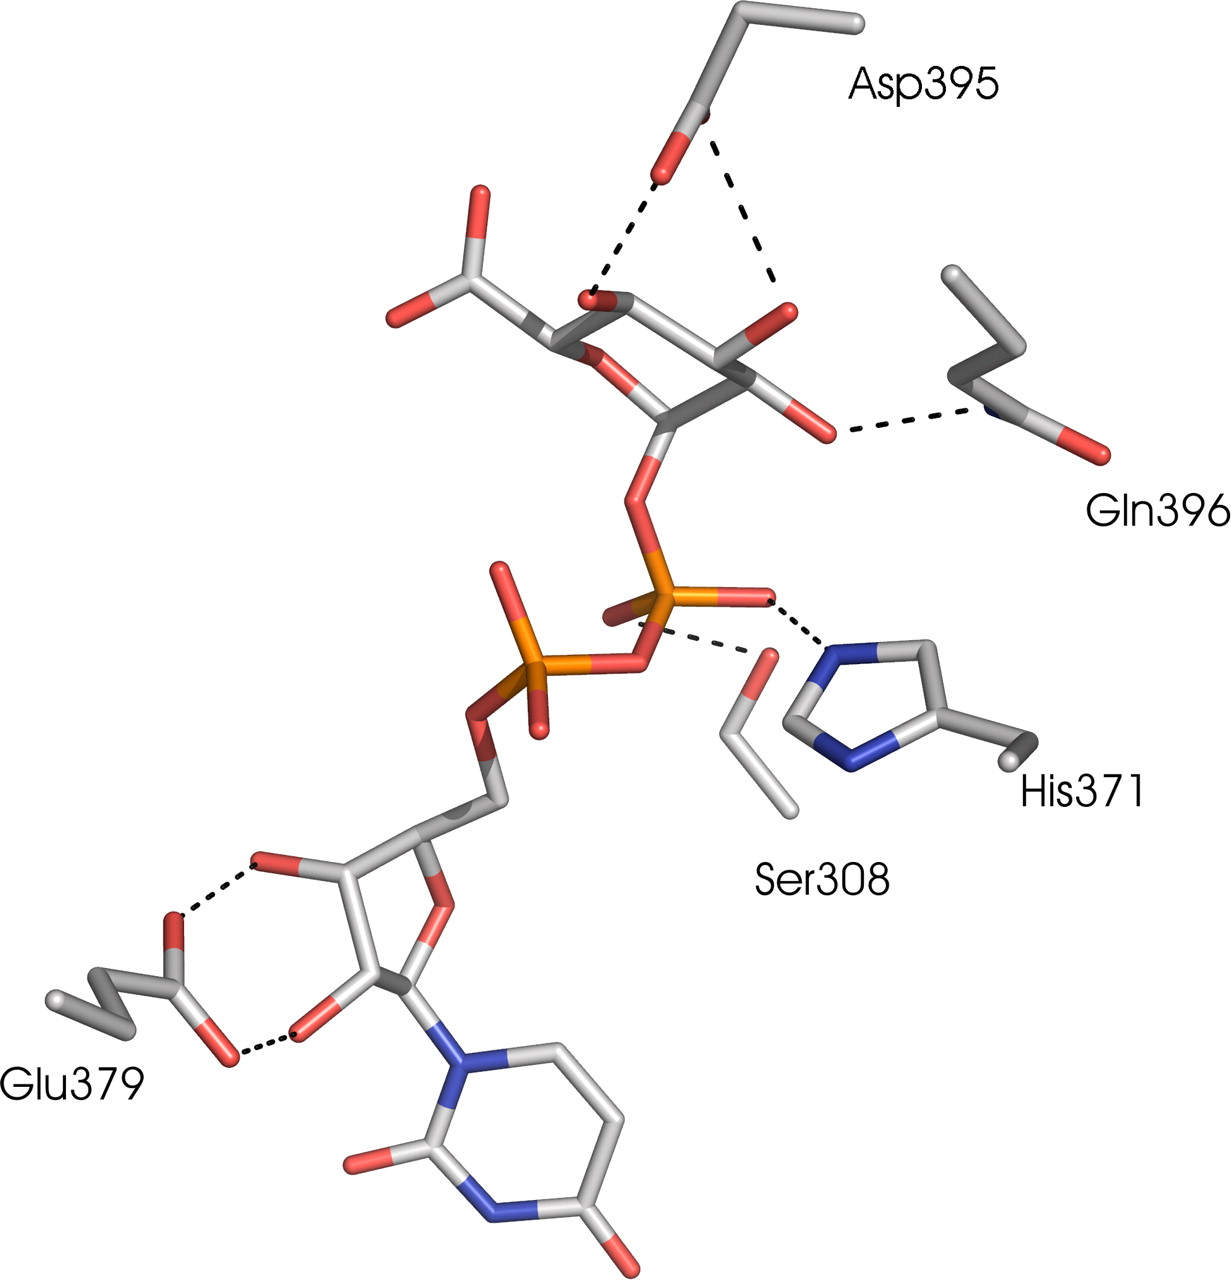 The Human UDP-Glucuronosyltransferase: Identification of